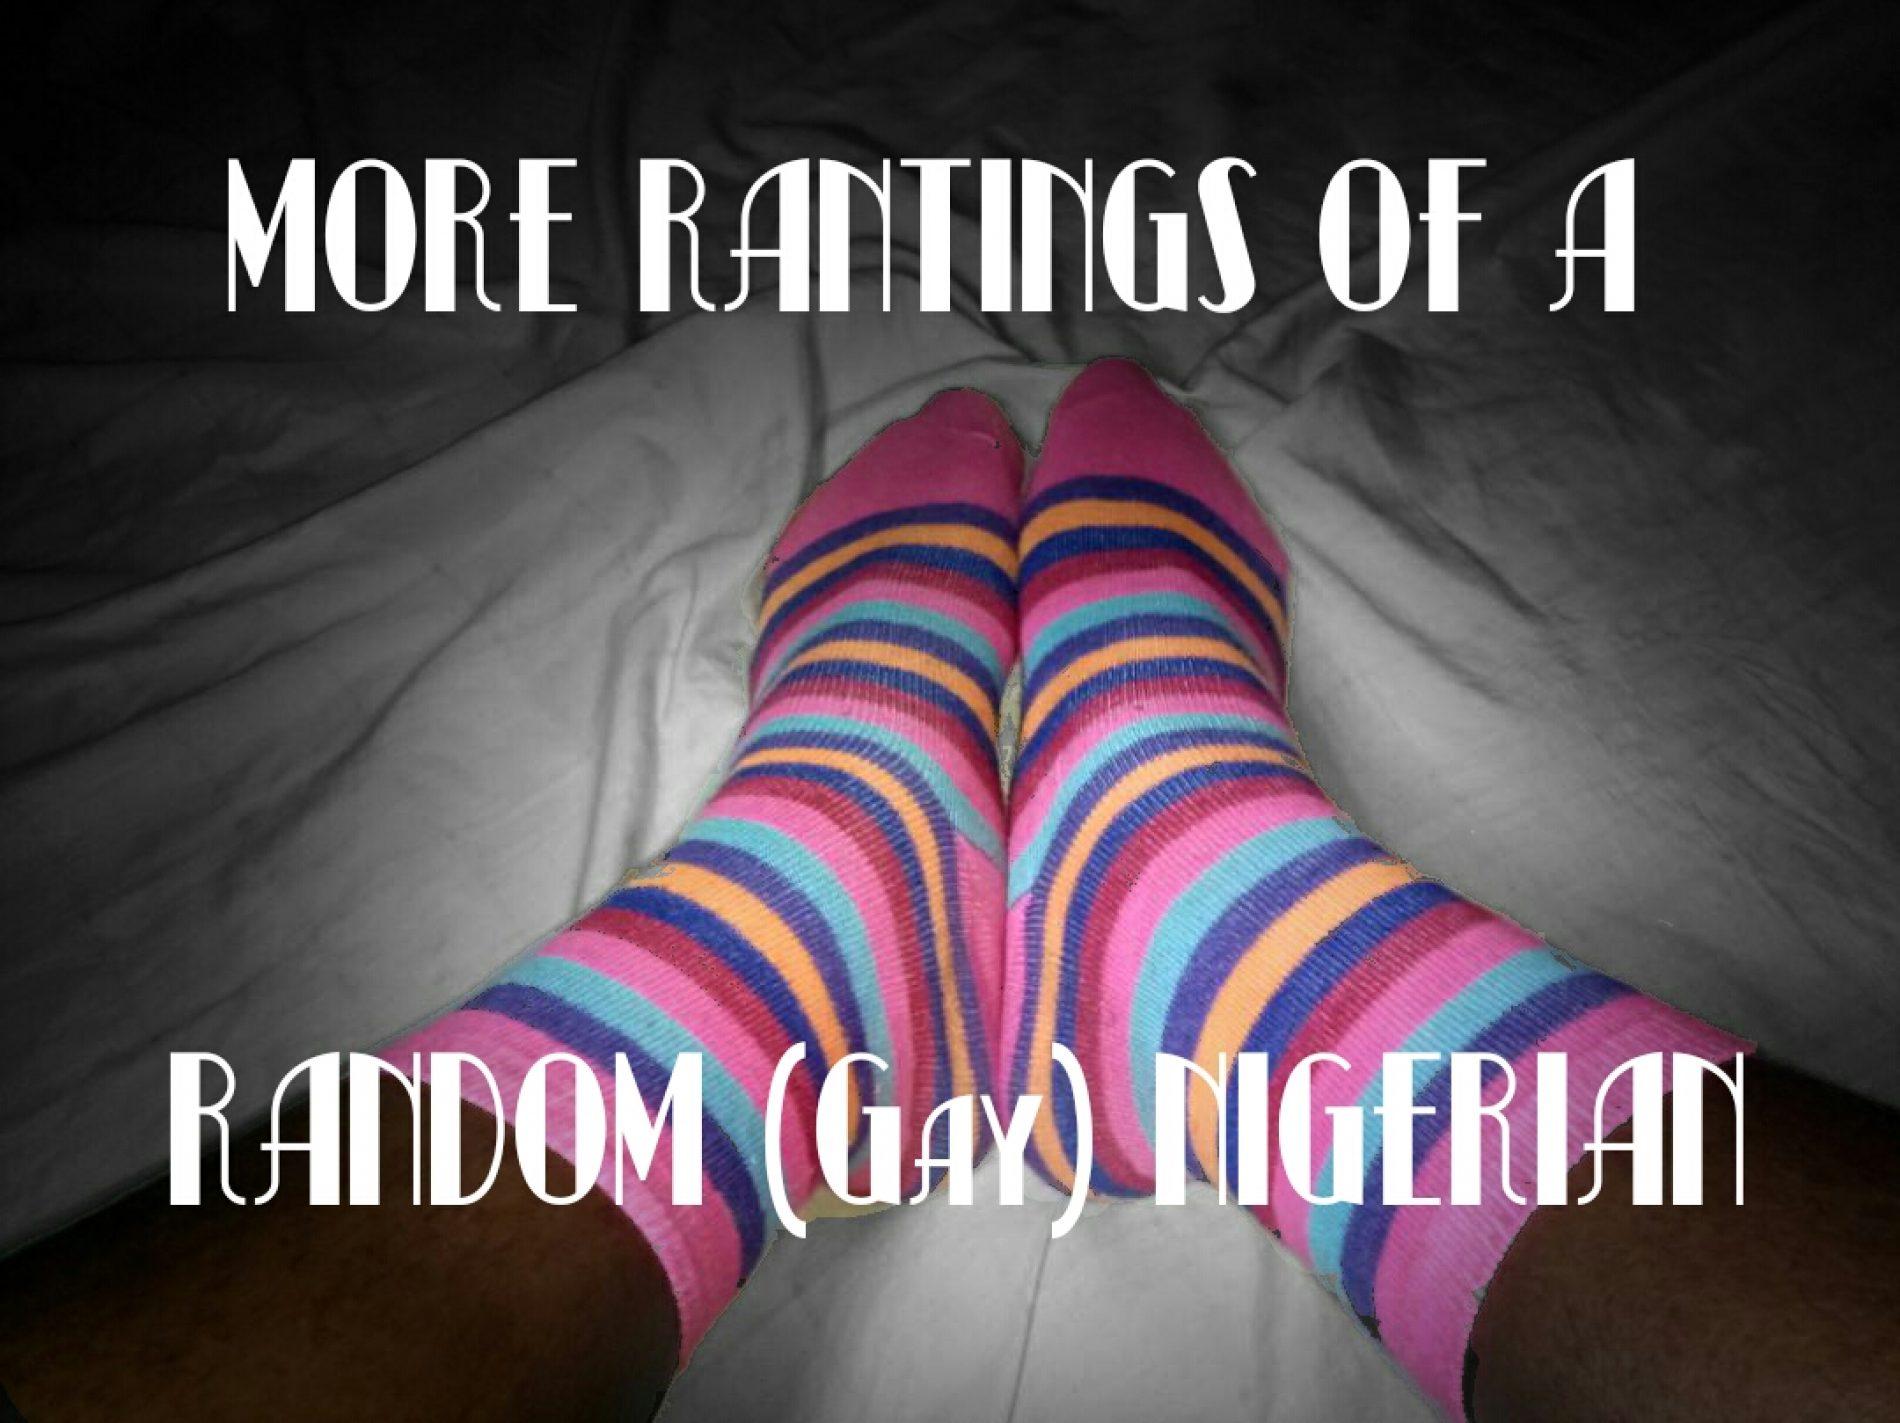 MORE RANTINGS OF A RANDOM (Gay) NIGERIAN (Entry 2)